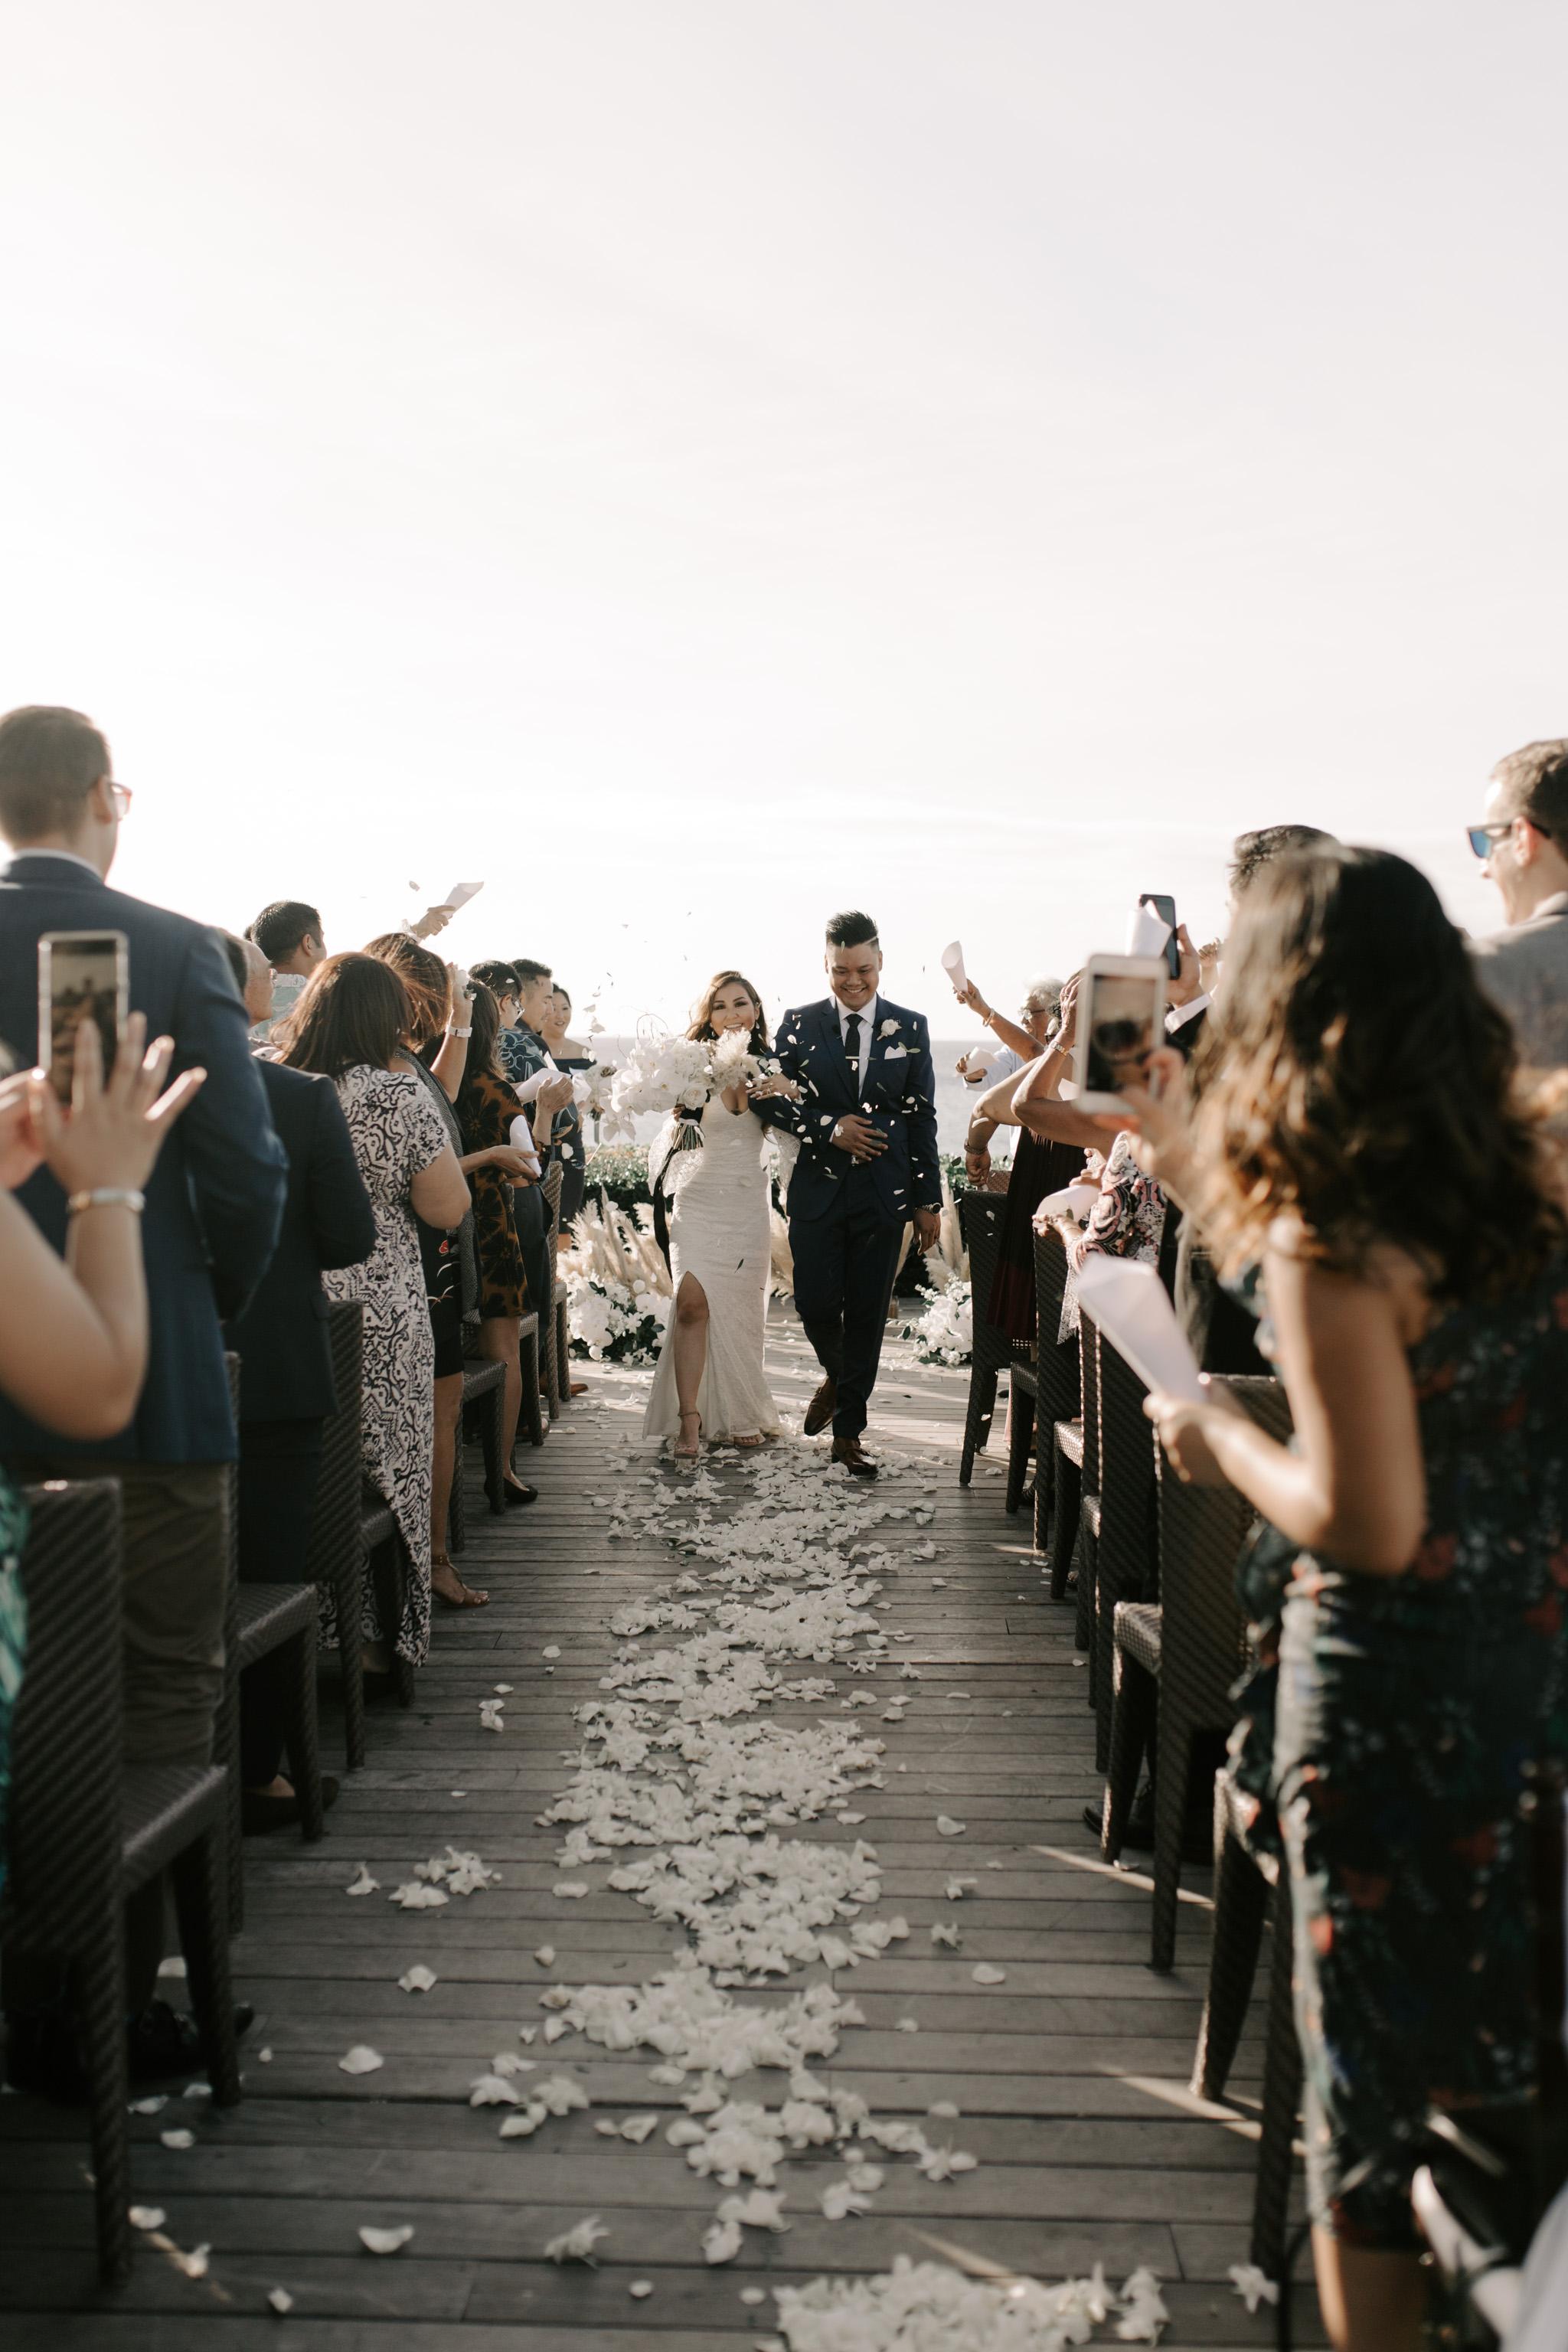 Flower petal exit   Merriman's Kapalua Maui wedding by Hawaii wedding photographer Desiree Leilani